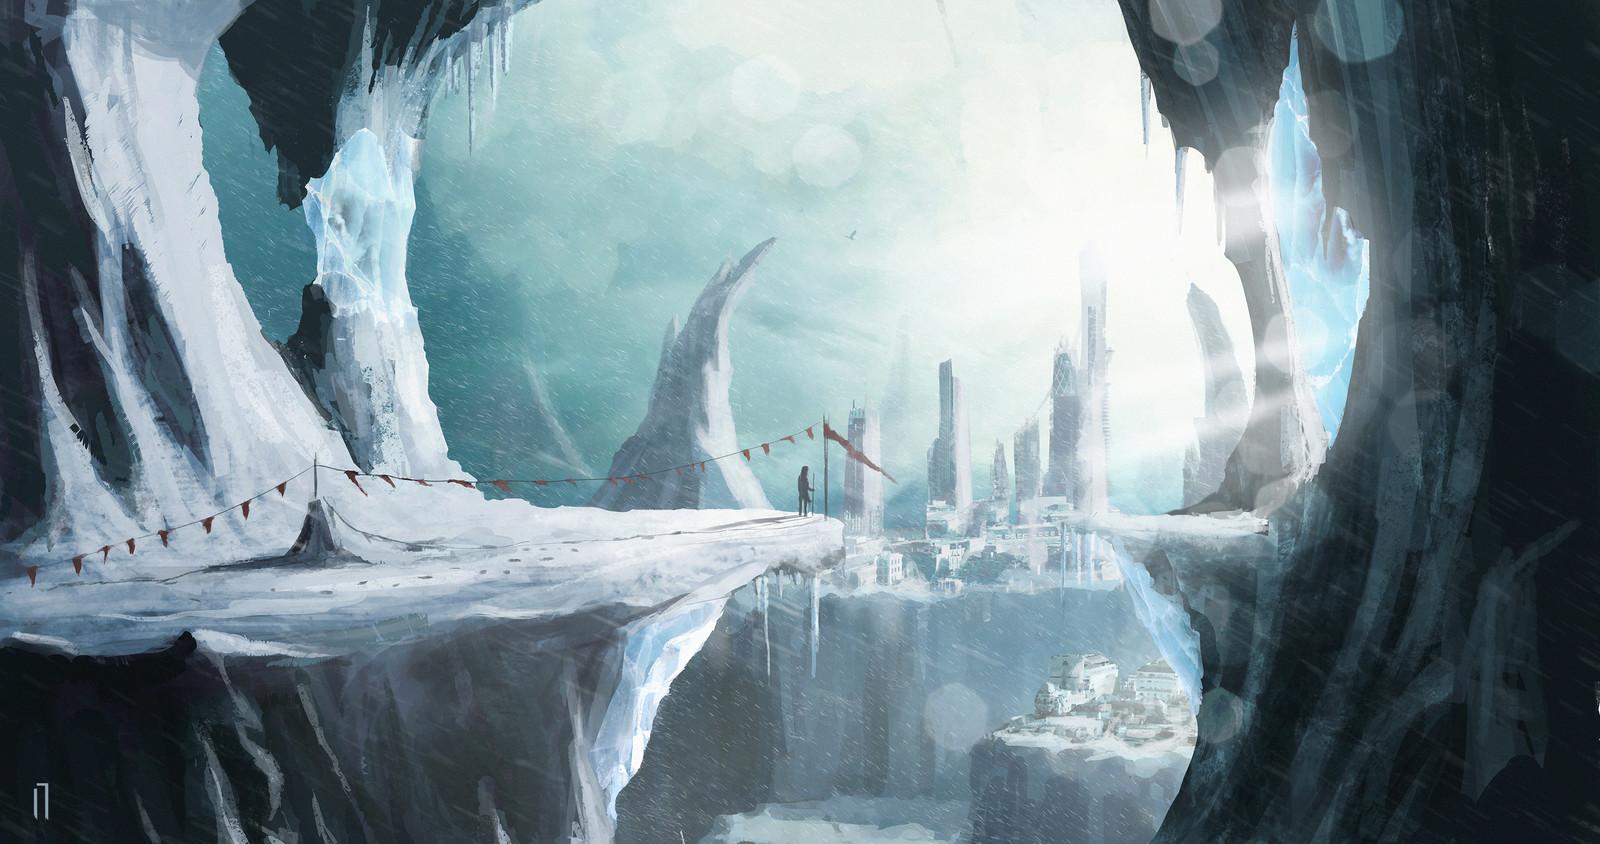 21st Century Ice Age